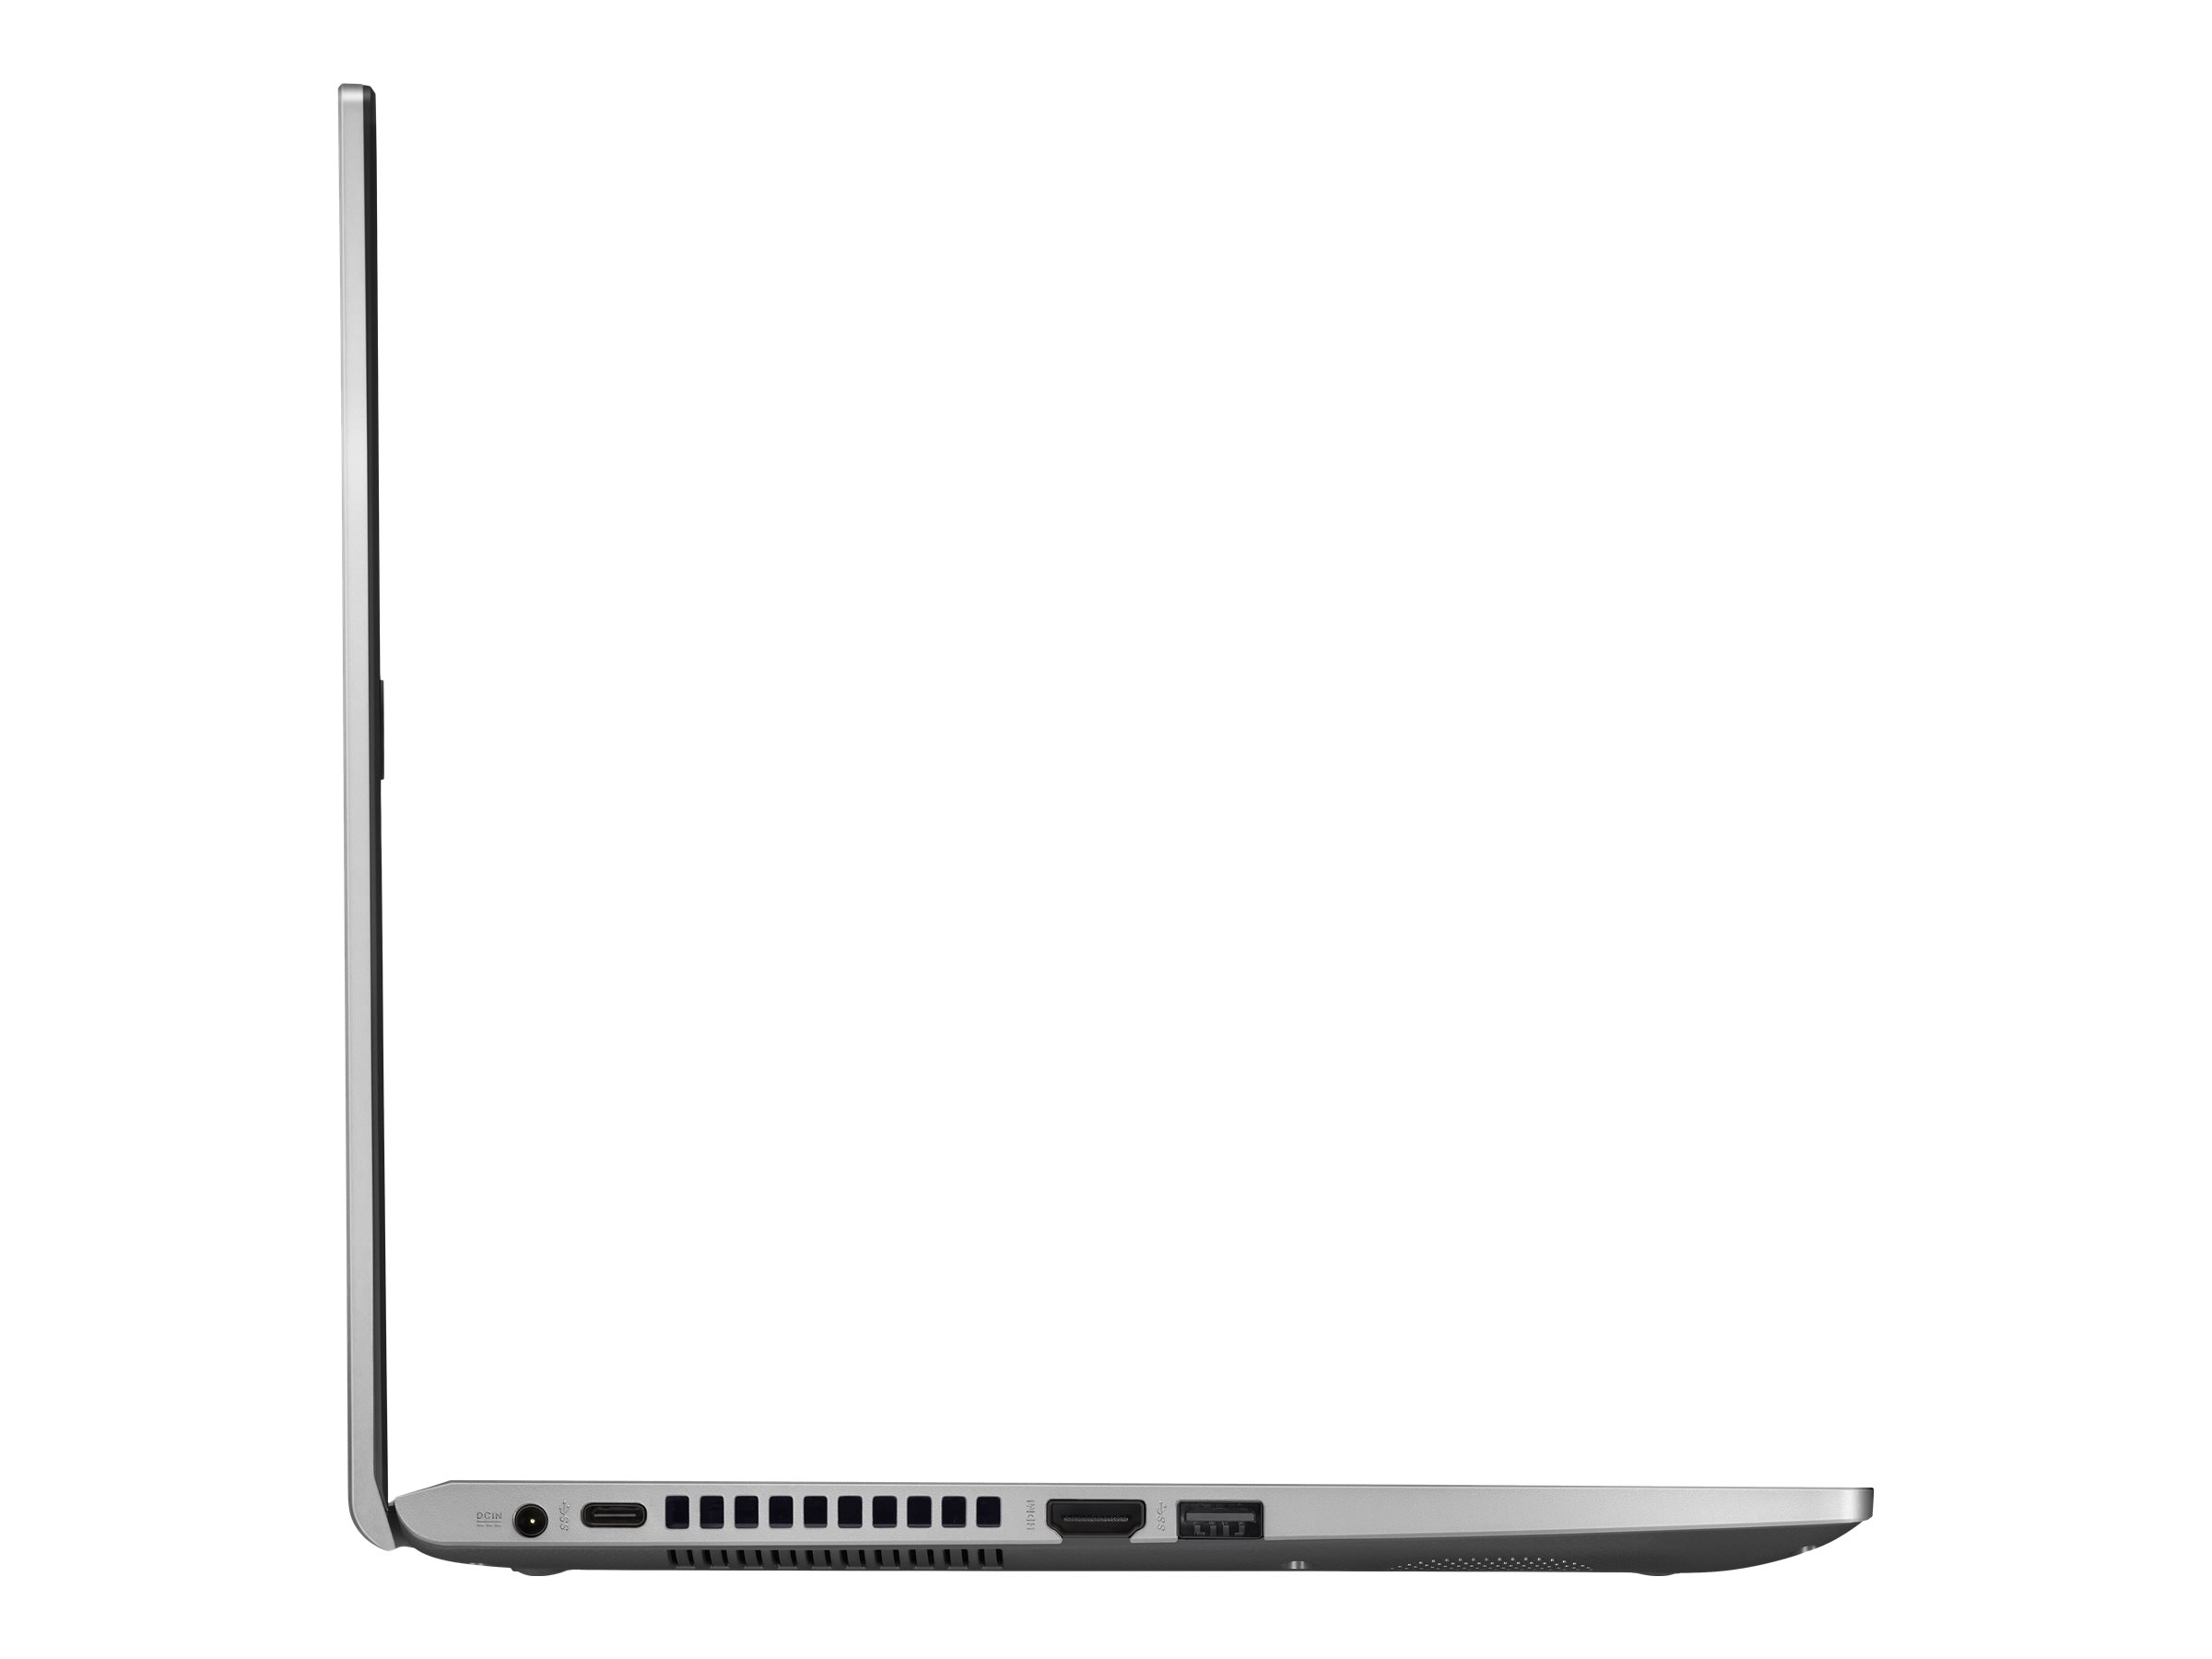 "ASUS 15 X509JA-EJ024T - Core i5 1035G1 / 1 GHz - Windows 10 Home - 8 GB RAM - 512 GB SSD NVMe - 39.6 cm (15.6"")"